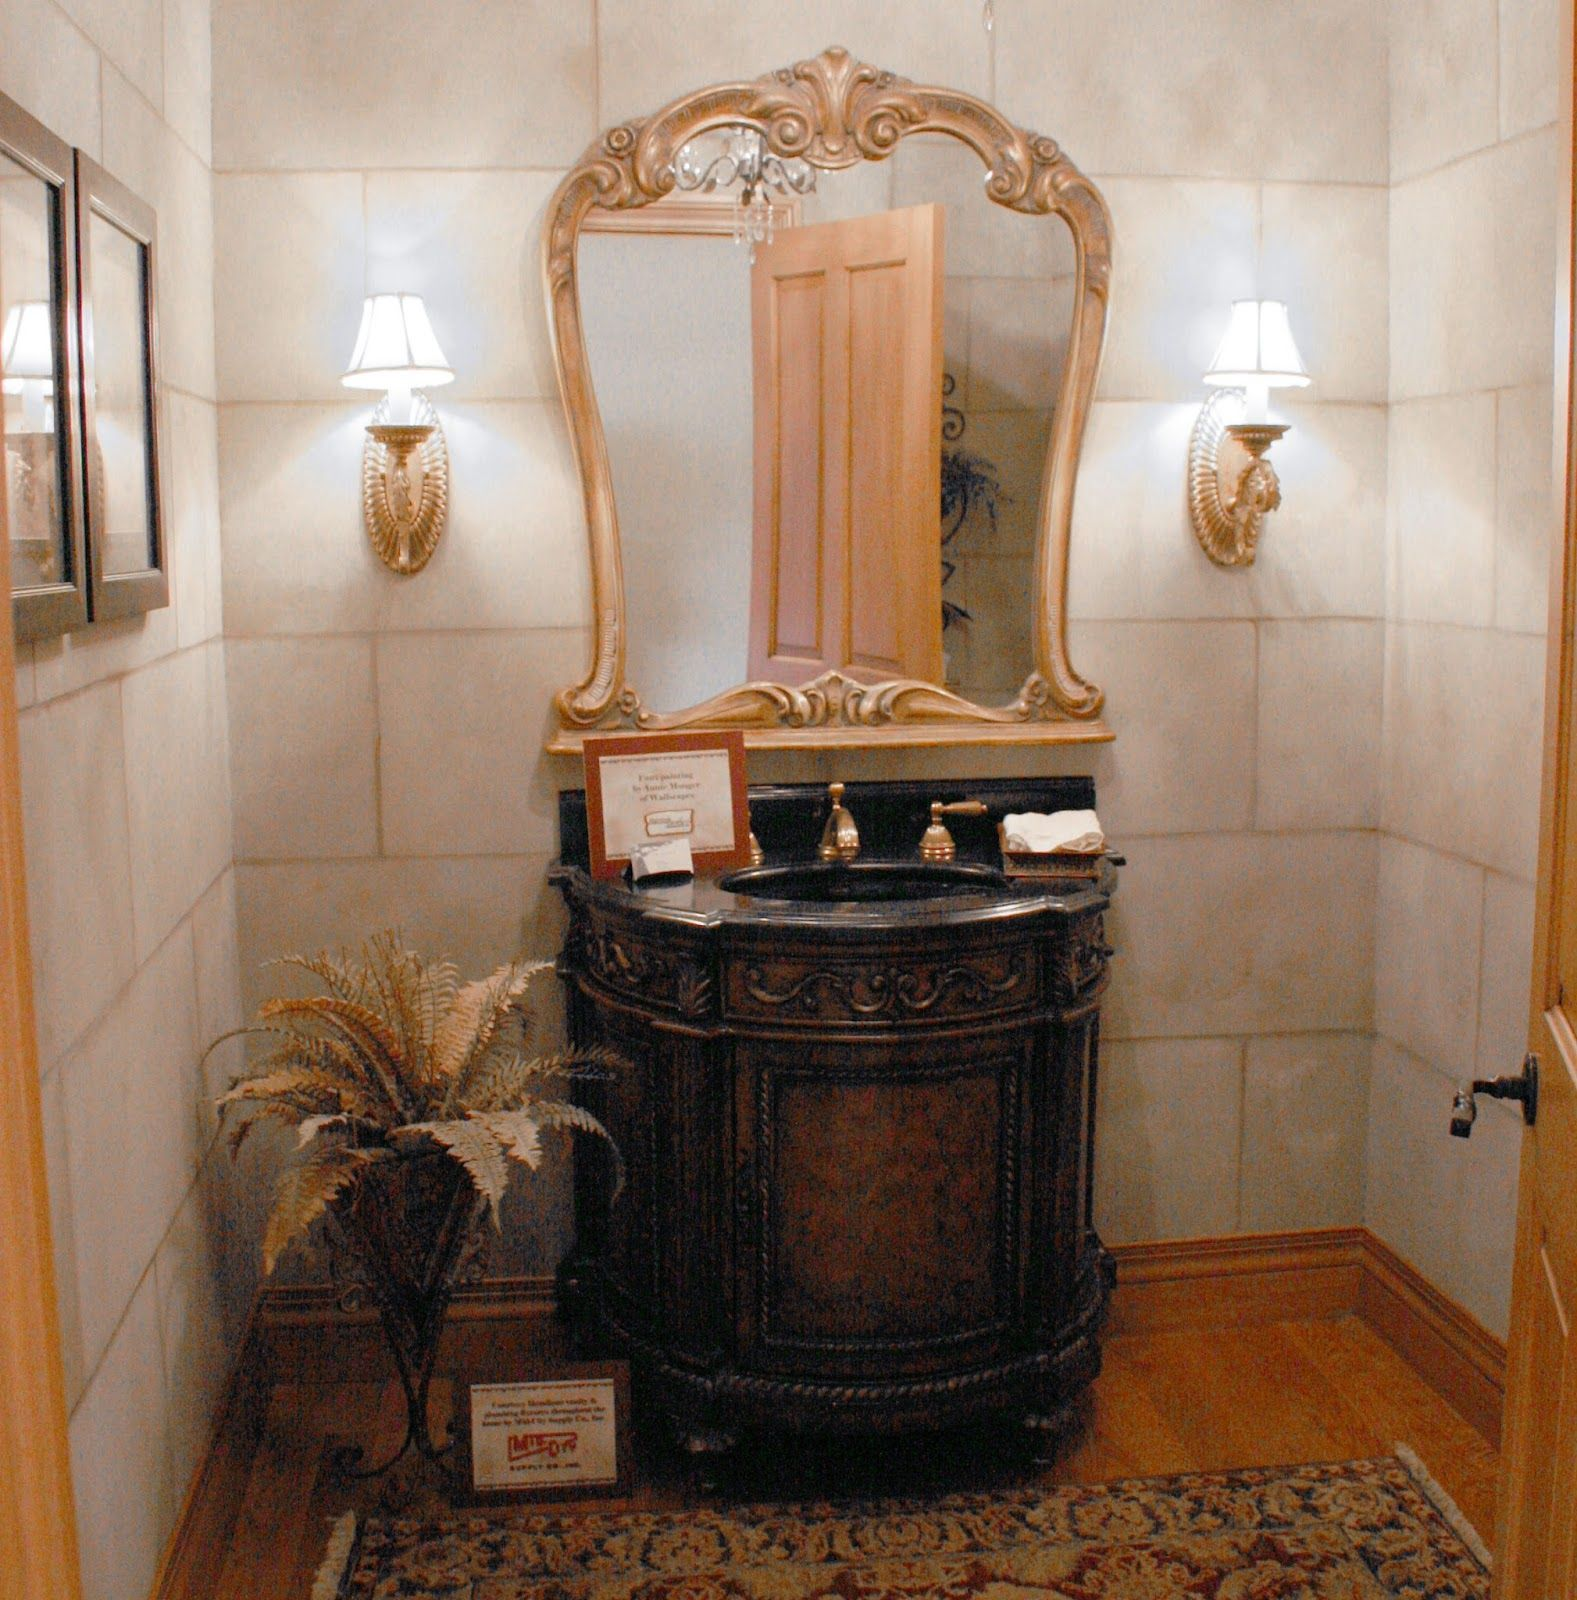 Importance Of Powder Room Vanities Darbylanefurniture Com In 2020 Powder Room Vanity Rustic Powder Room Powder Room Design